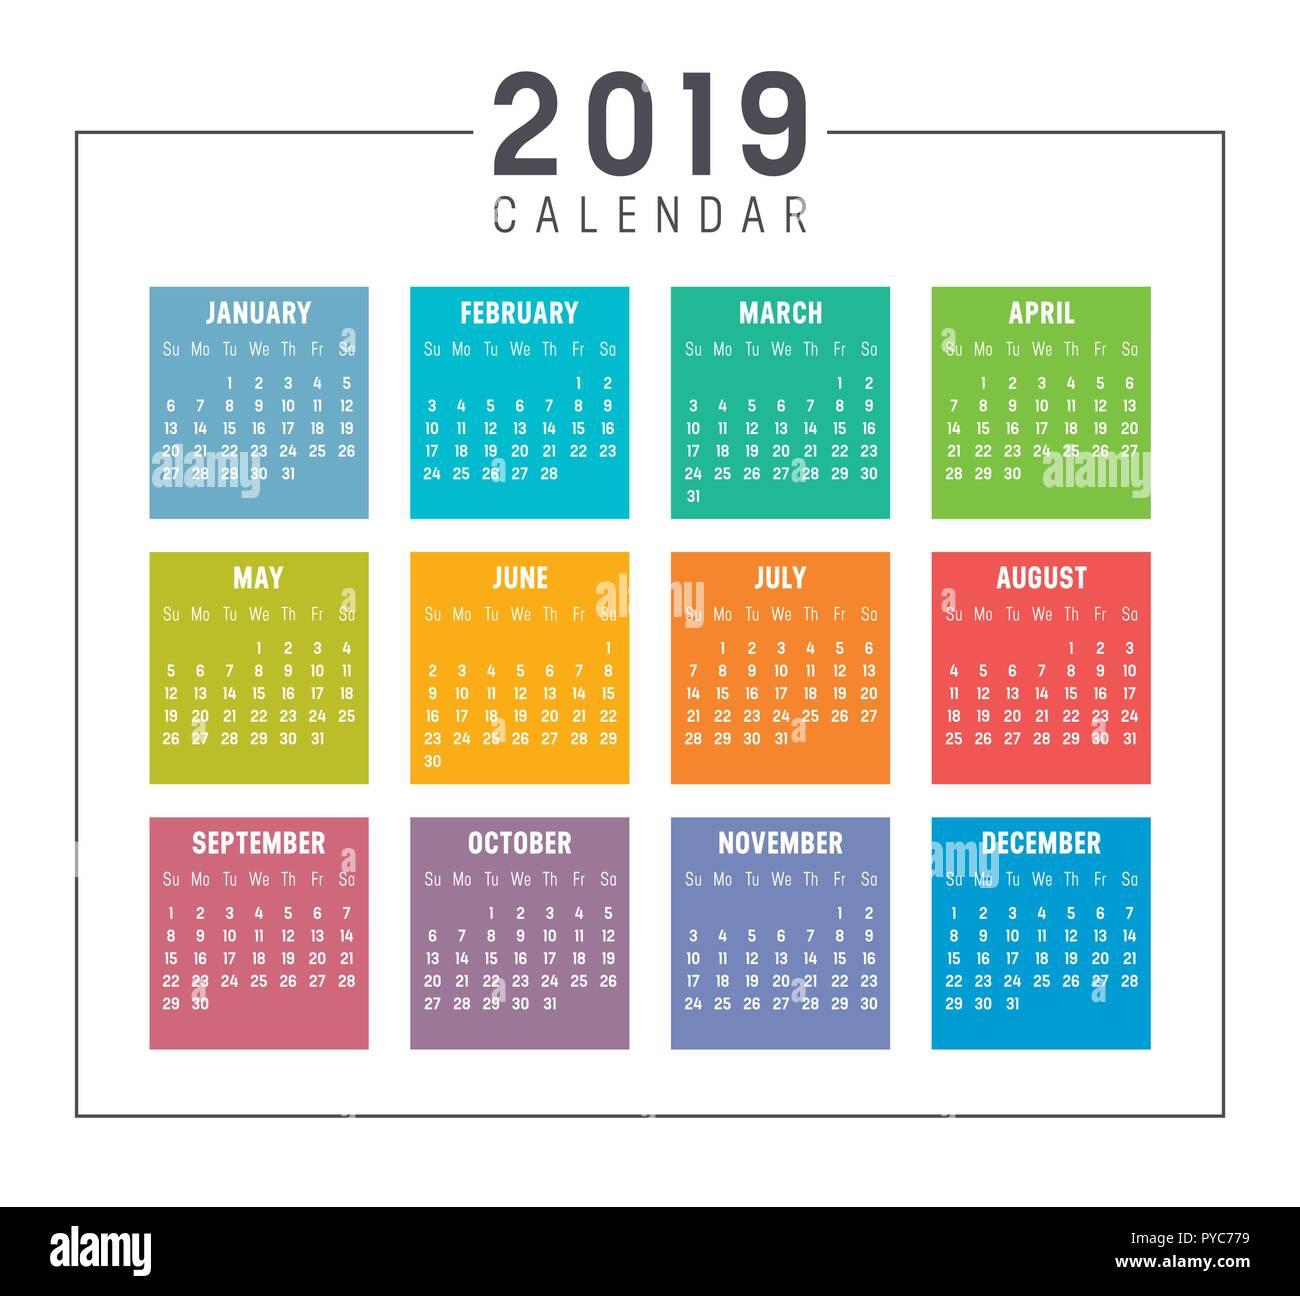 kalender woche 2019